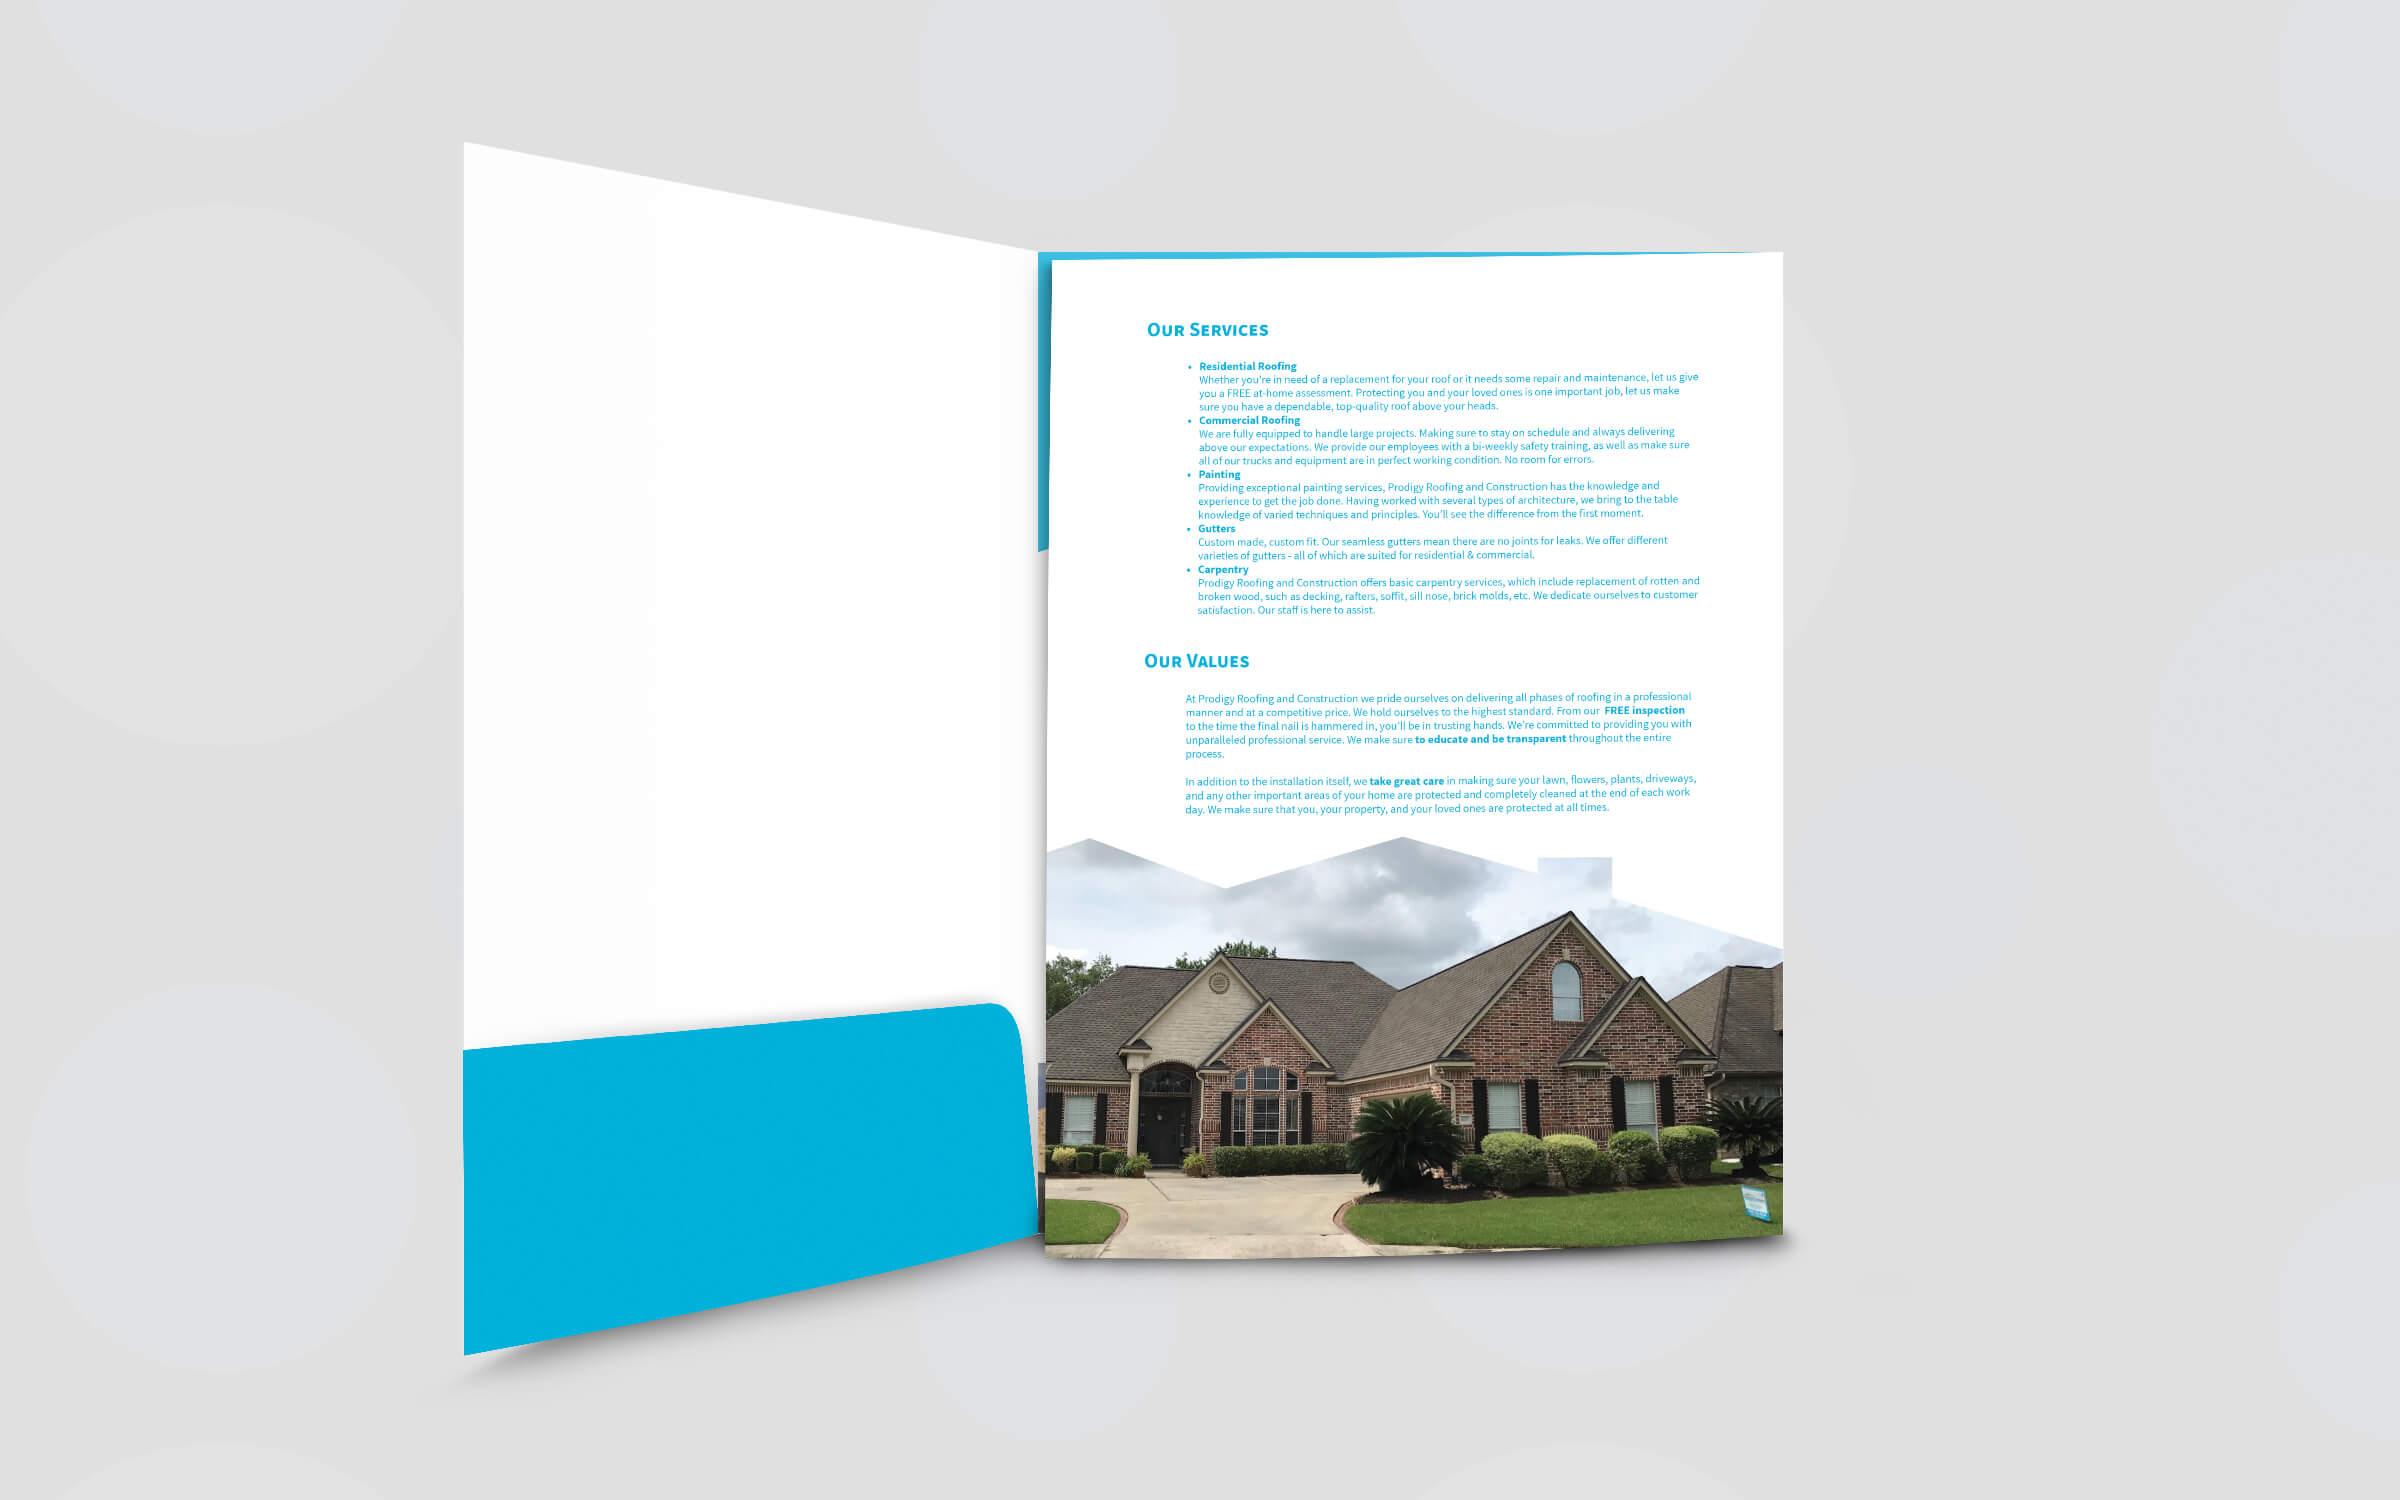 prodigy roofing system folder inside